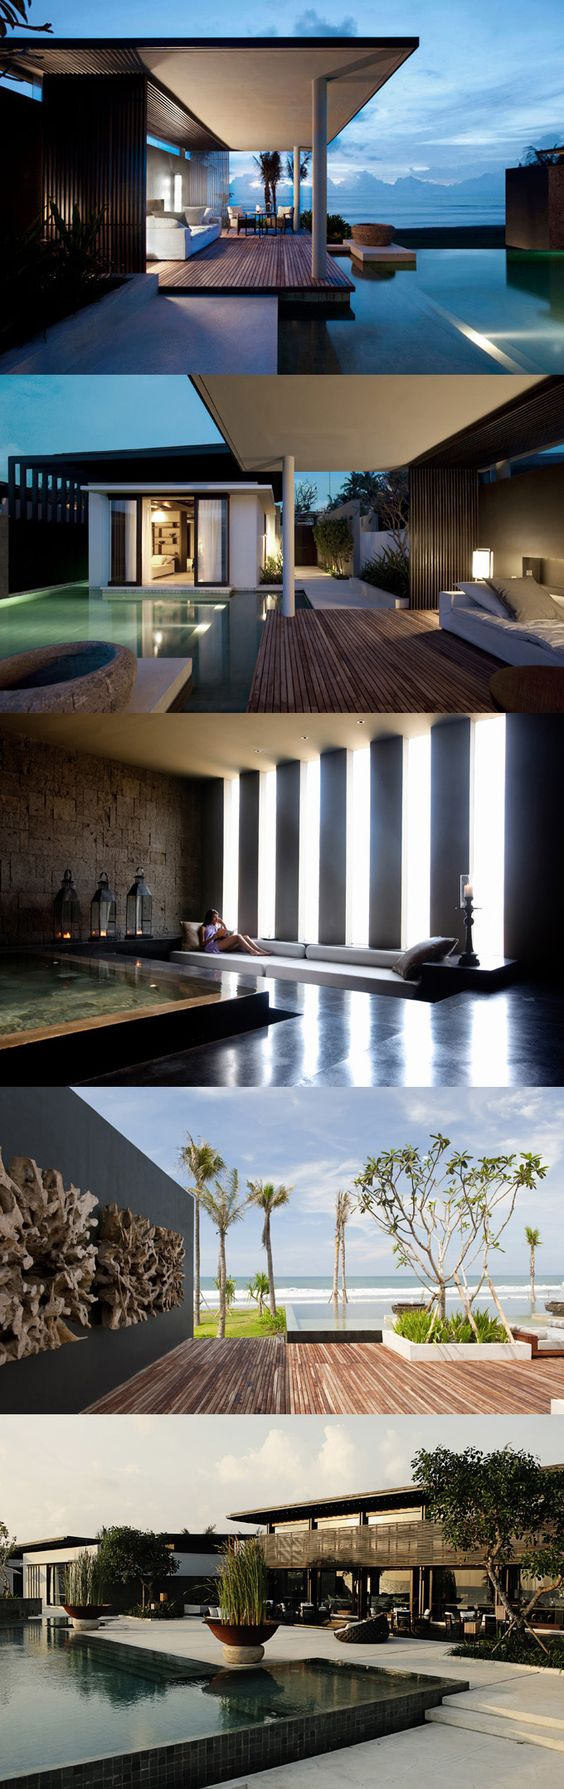 Amazing Bali Hotel in Peaceful Surroundings! -Alila Villas Soori, Bali